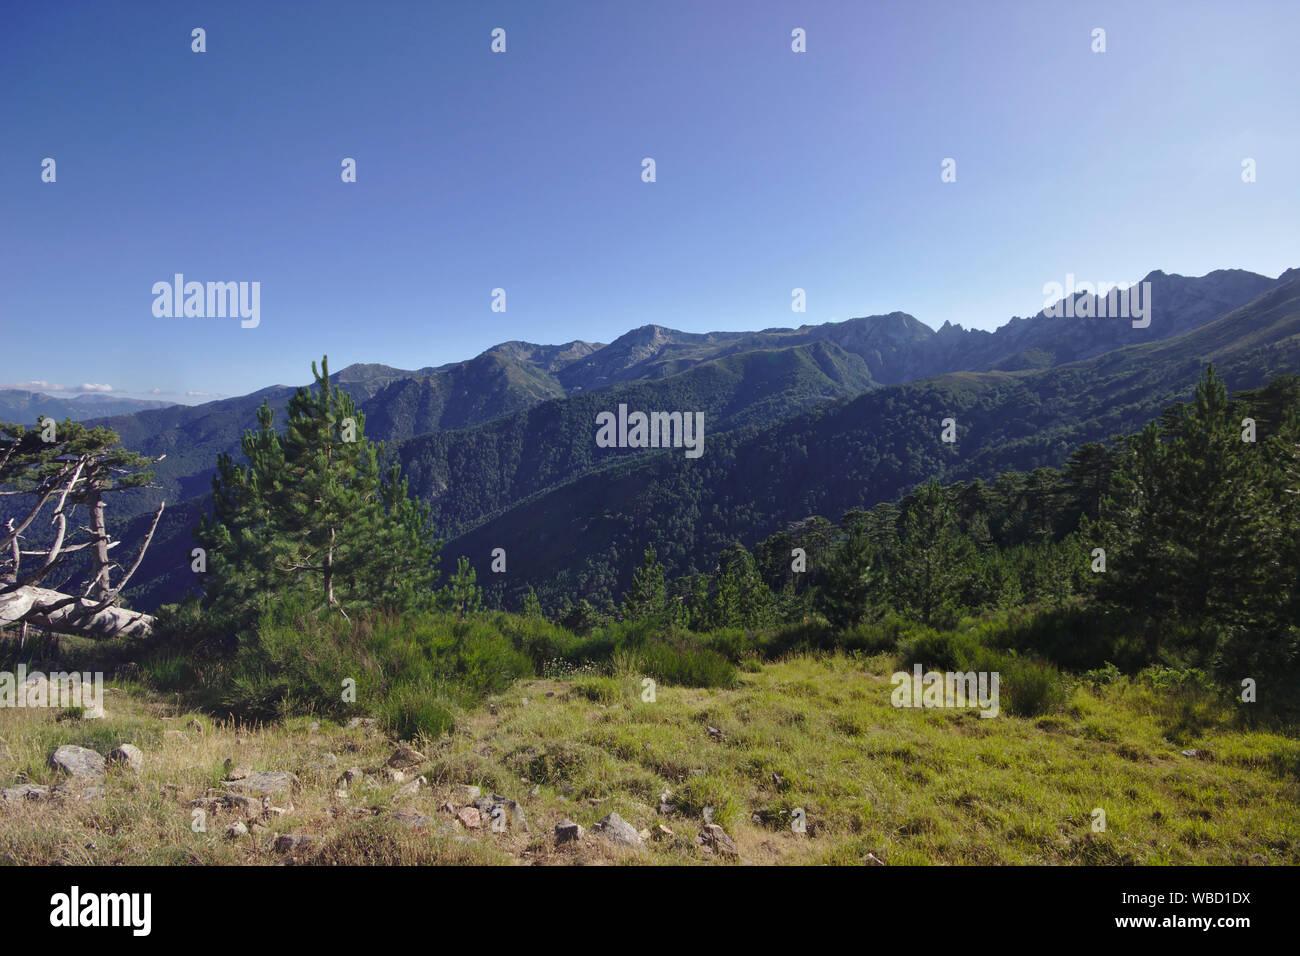 Punta dell'Oriente and Monte Renoso from GR20 near Bergeries de Cardo, France, Corsica, GR20 Stock Photo